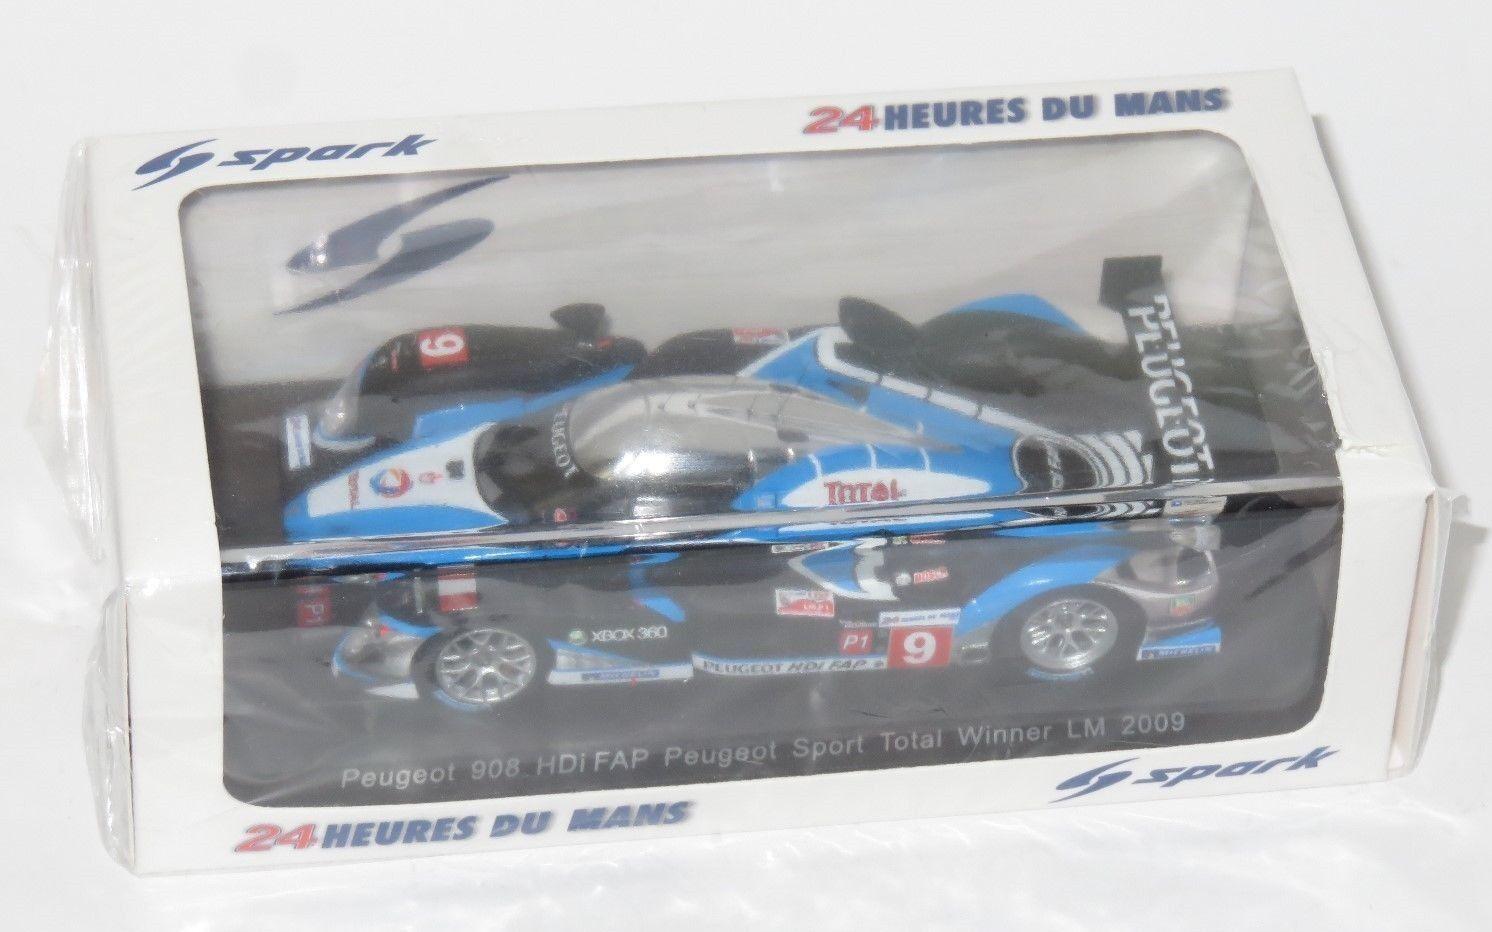 PEUGEOT 908 HDI FAP PEUGEOT SPORT TOTAL Winner Le Mans 24 ore 2009  9